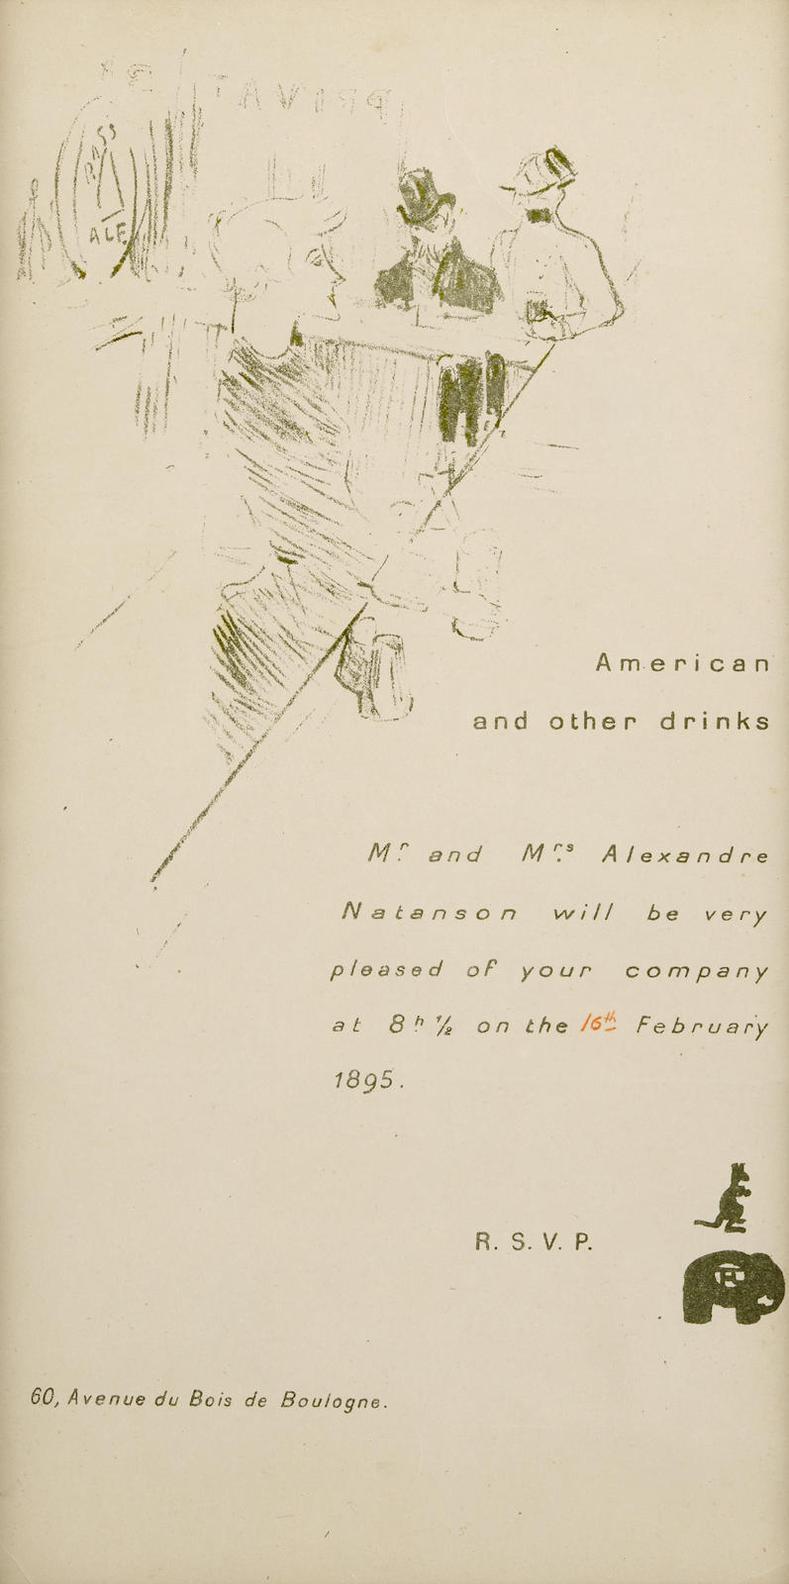 Henri de Toulouse-Lautrec-Invitation Mr And Mrs Alexandre Natanson-1895